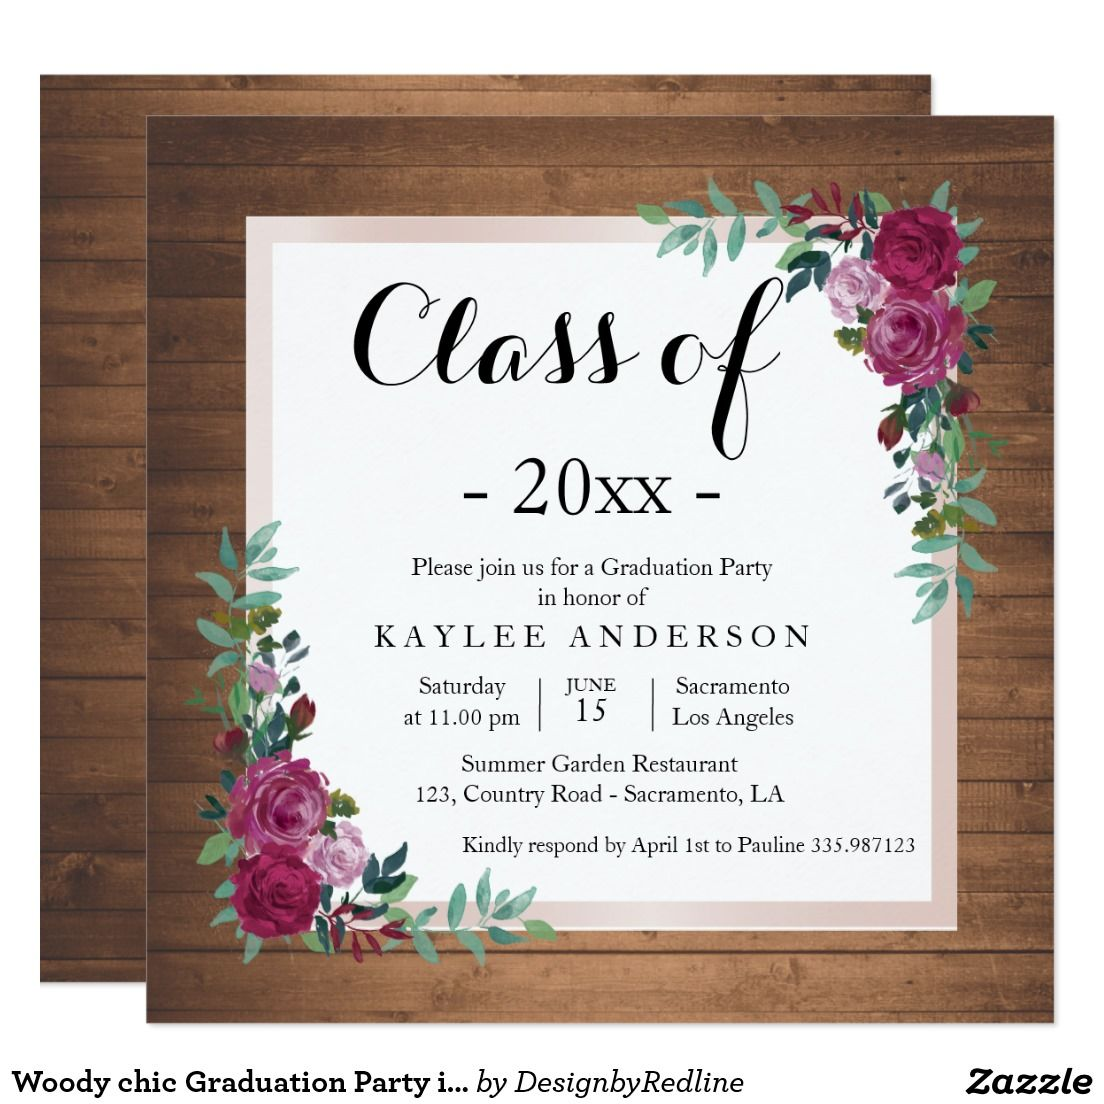 Woody chic Graduation Party invitation | Graduation PARTY ...